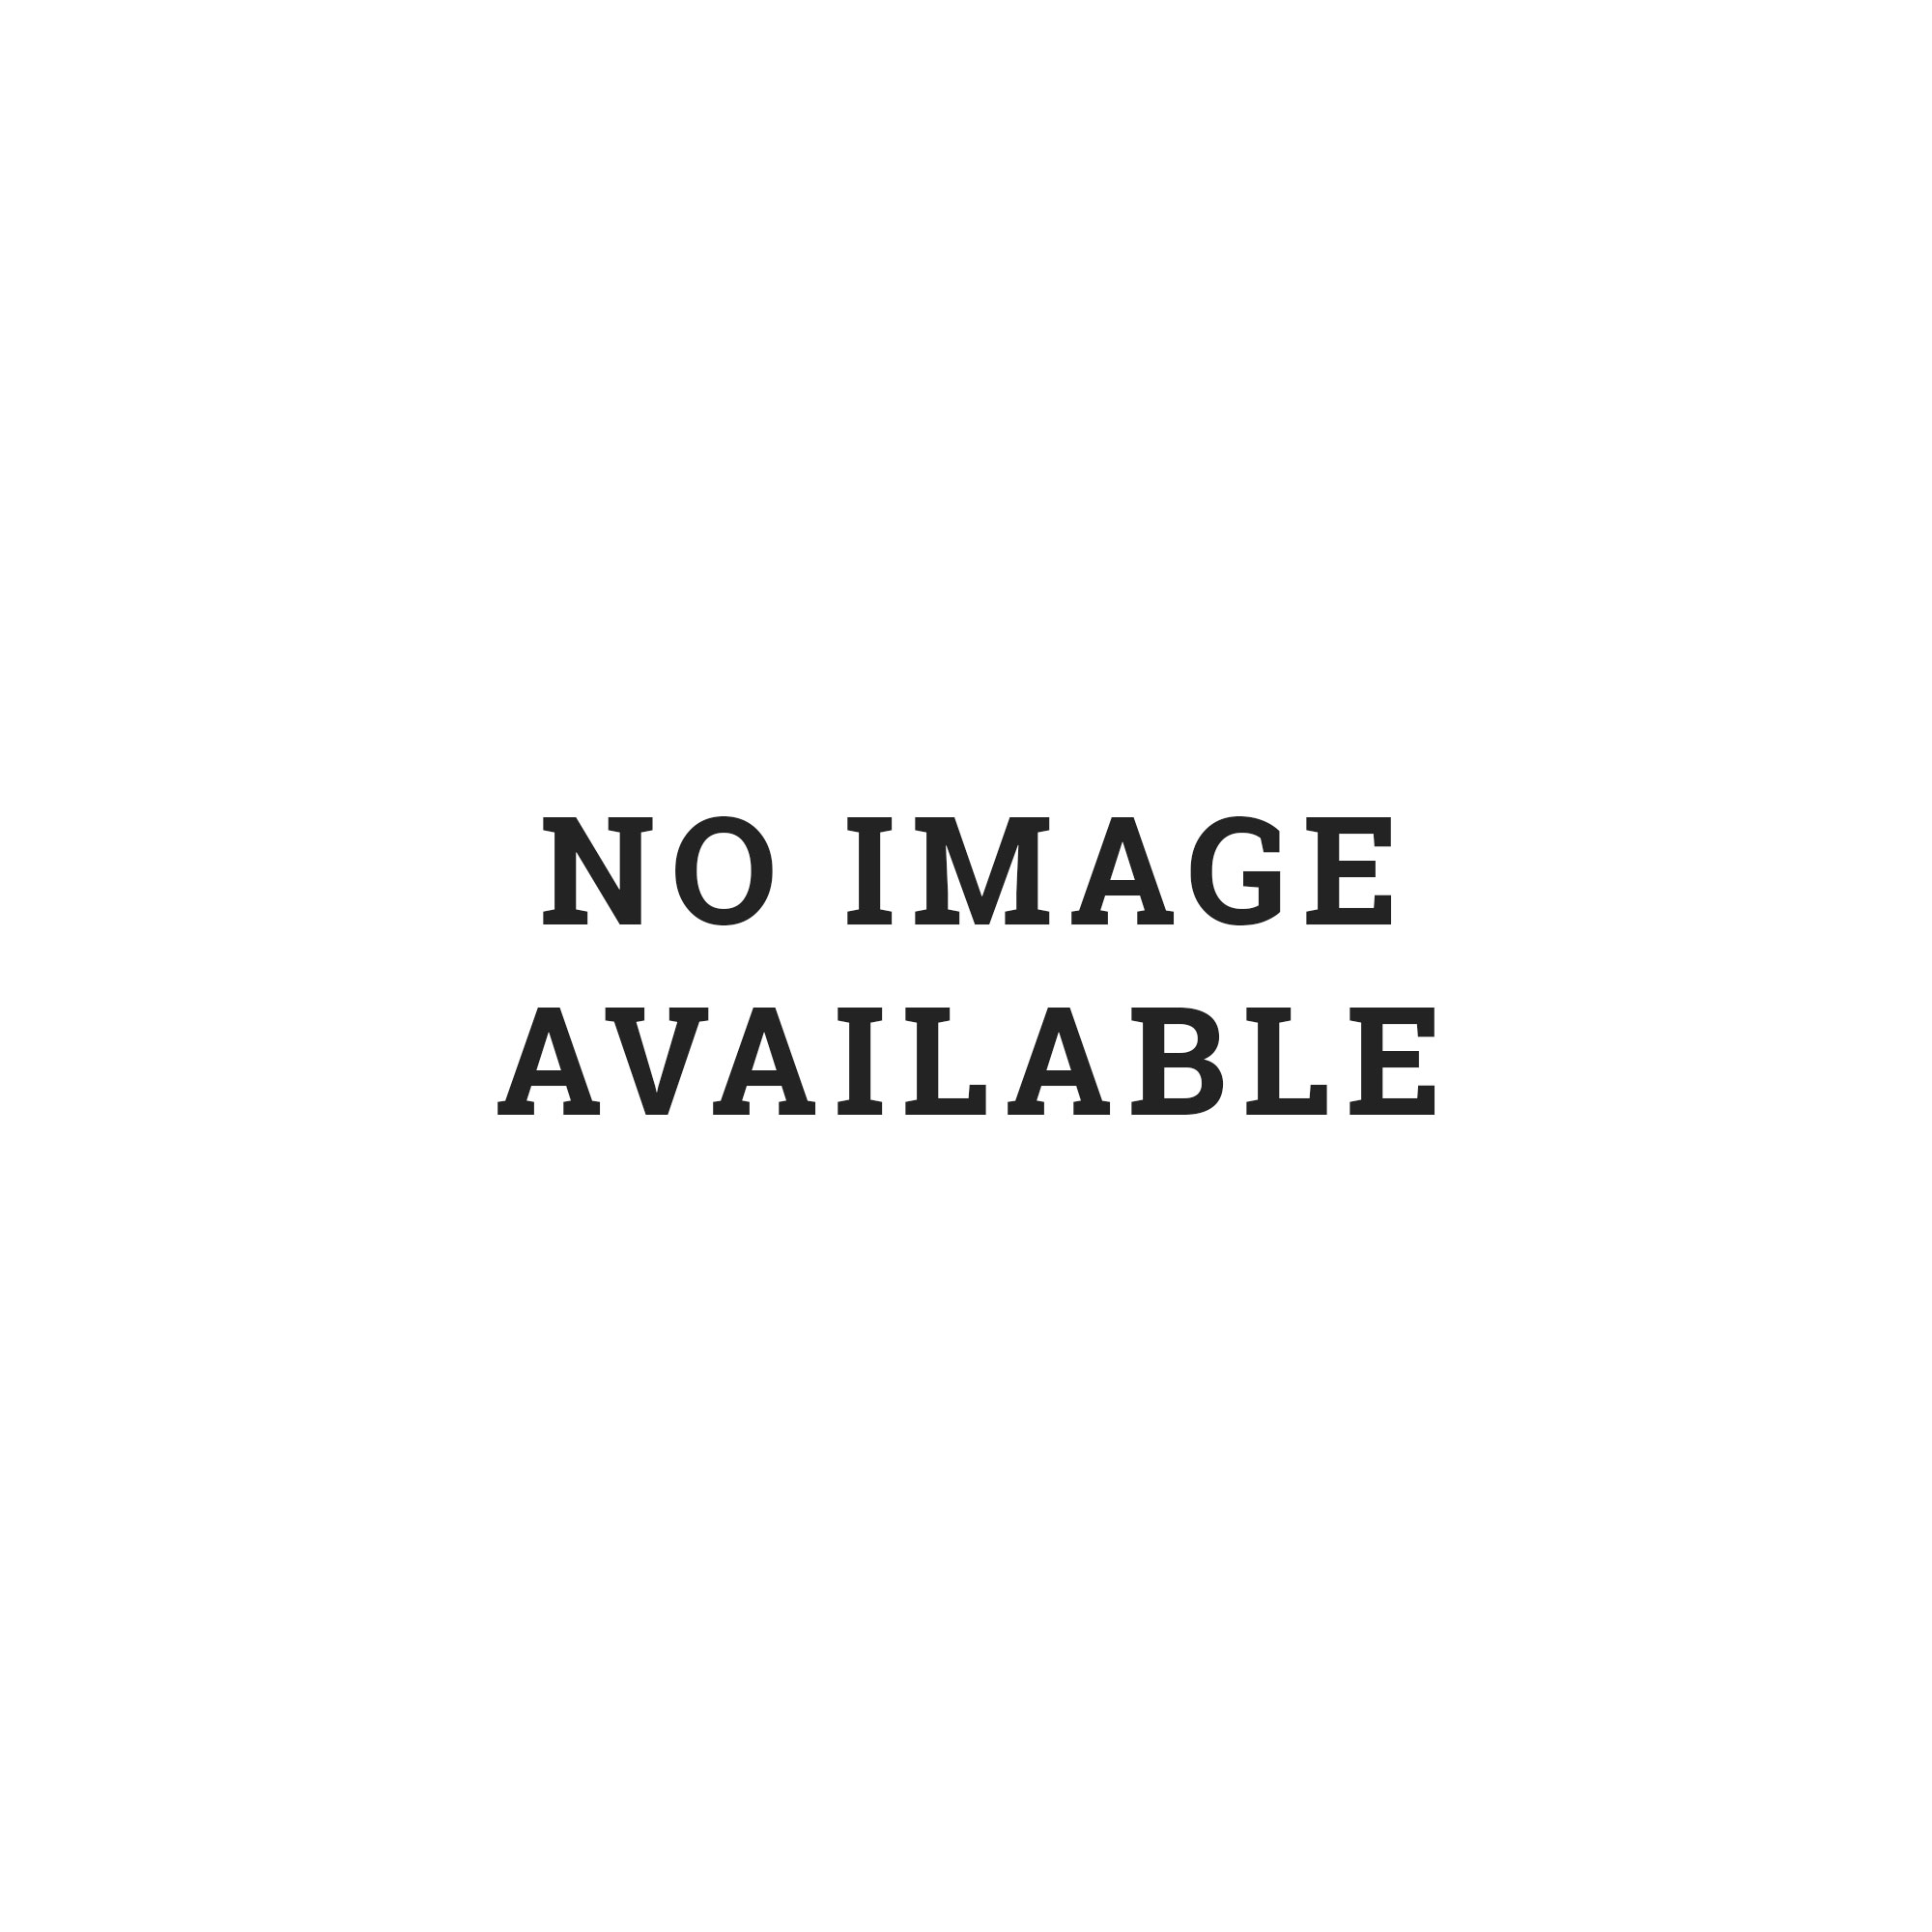 Converse 132308C Unisex Canvas Chuck Taylor All Star Hi Basketball Boots - Blue Ribbon